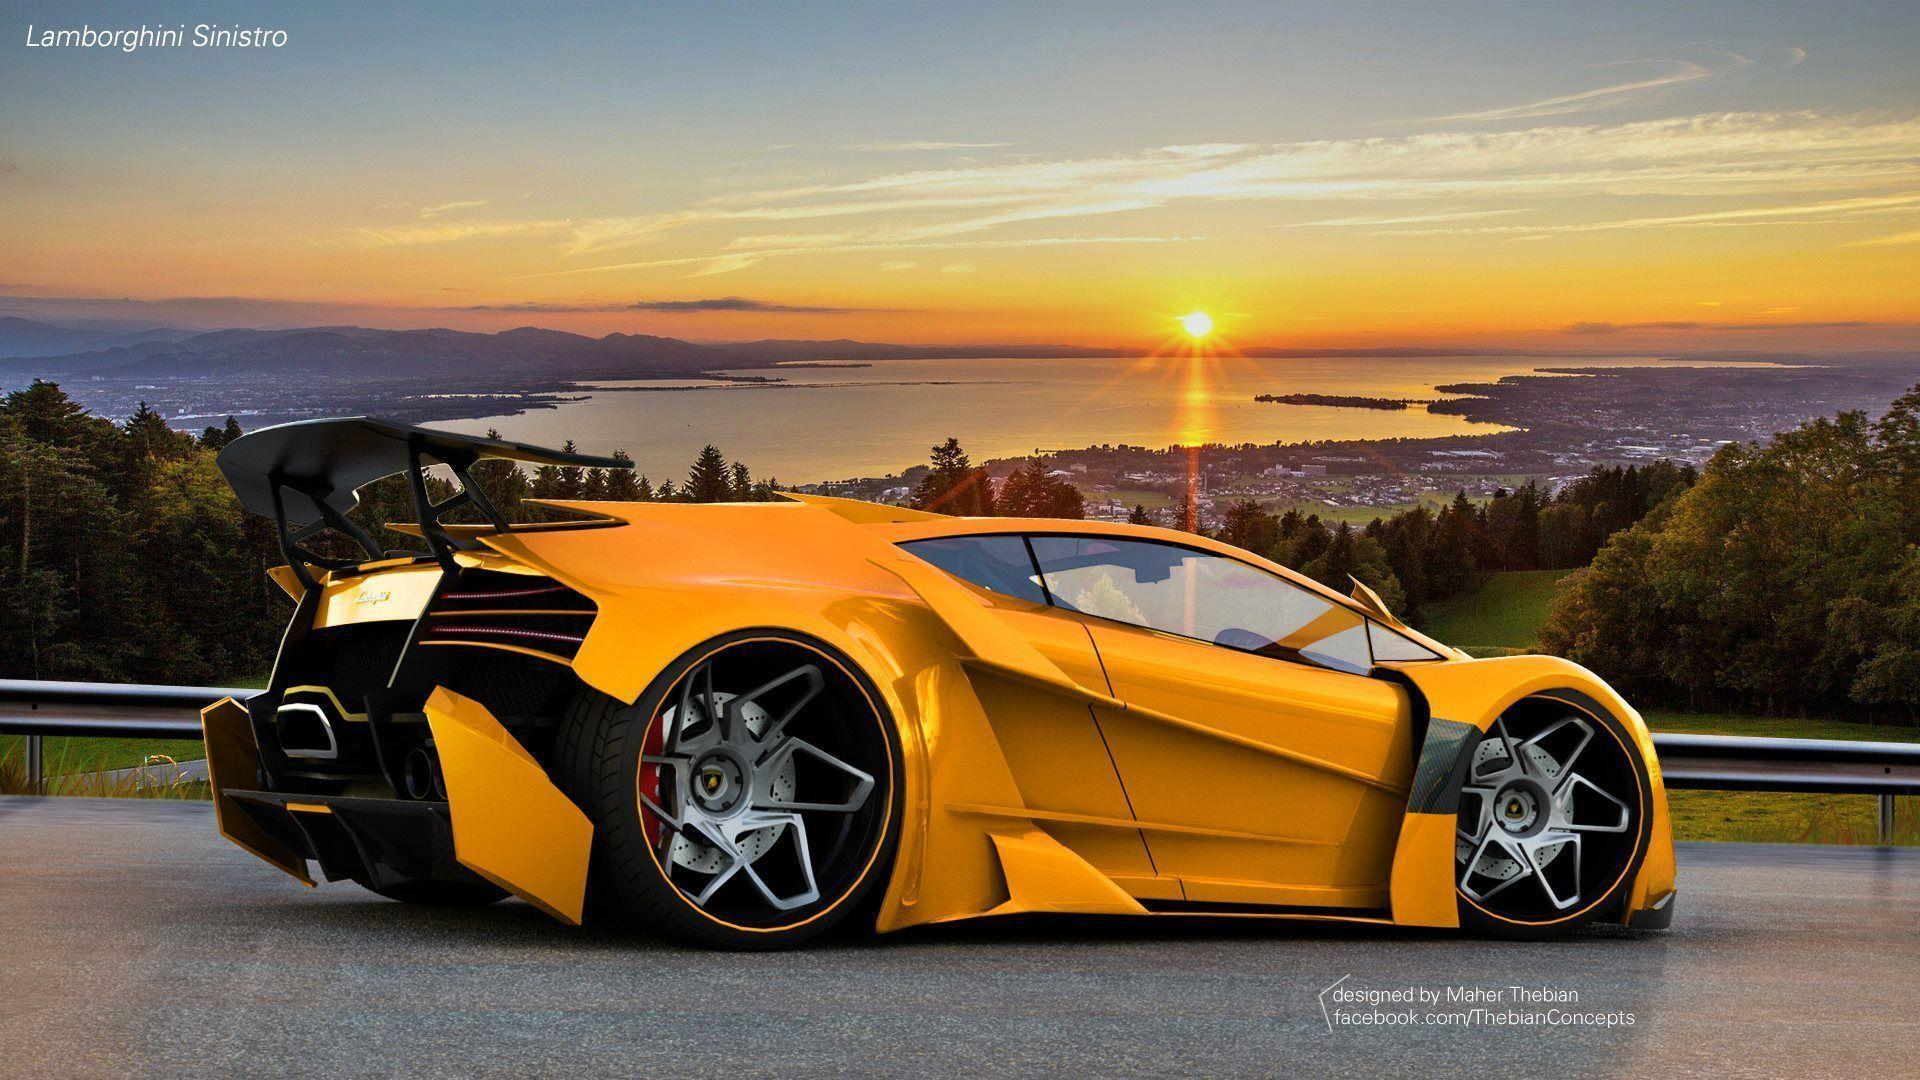 Lamborghini Wallpapers 1080p